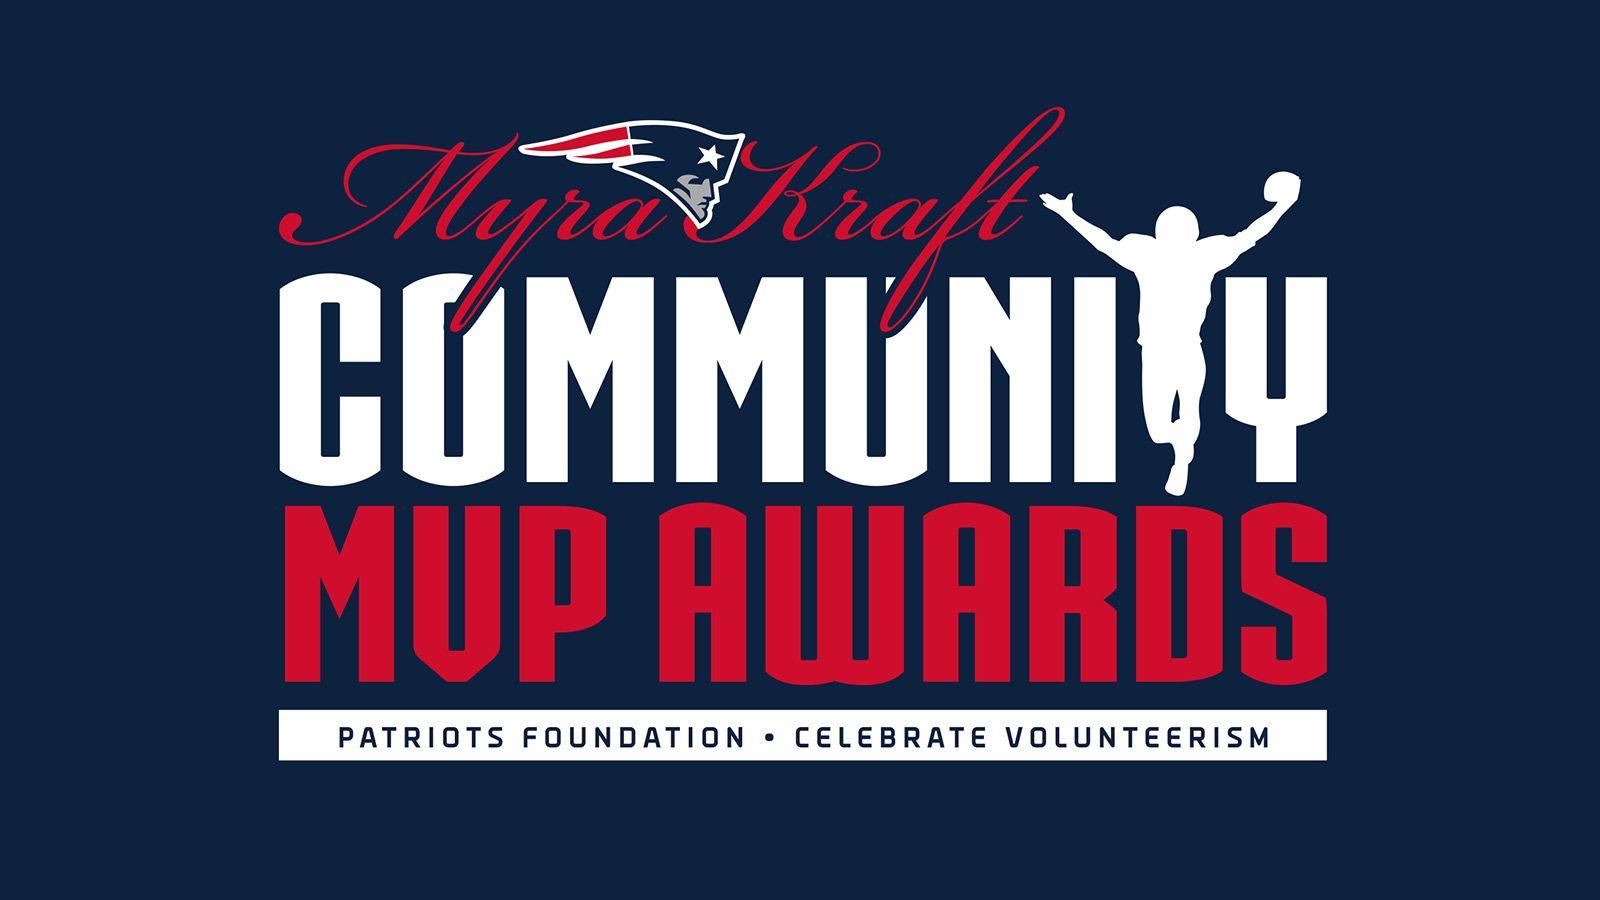 Myra Kraft Community MVP Awards